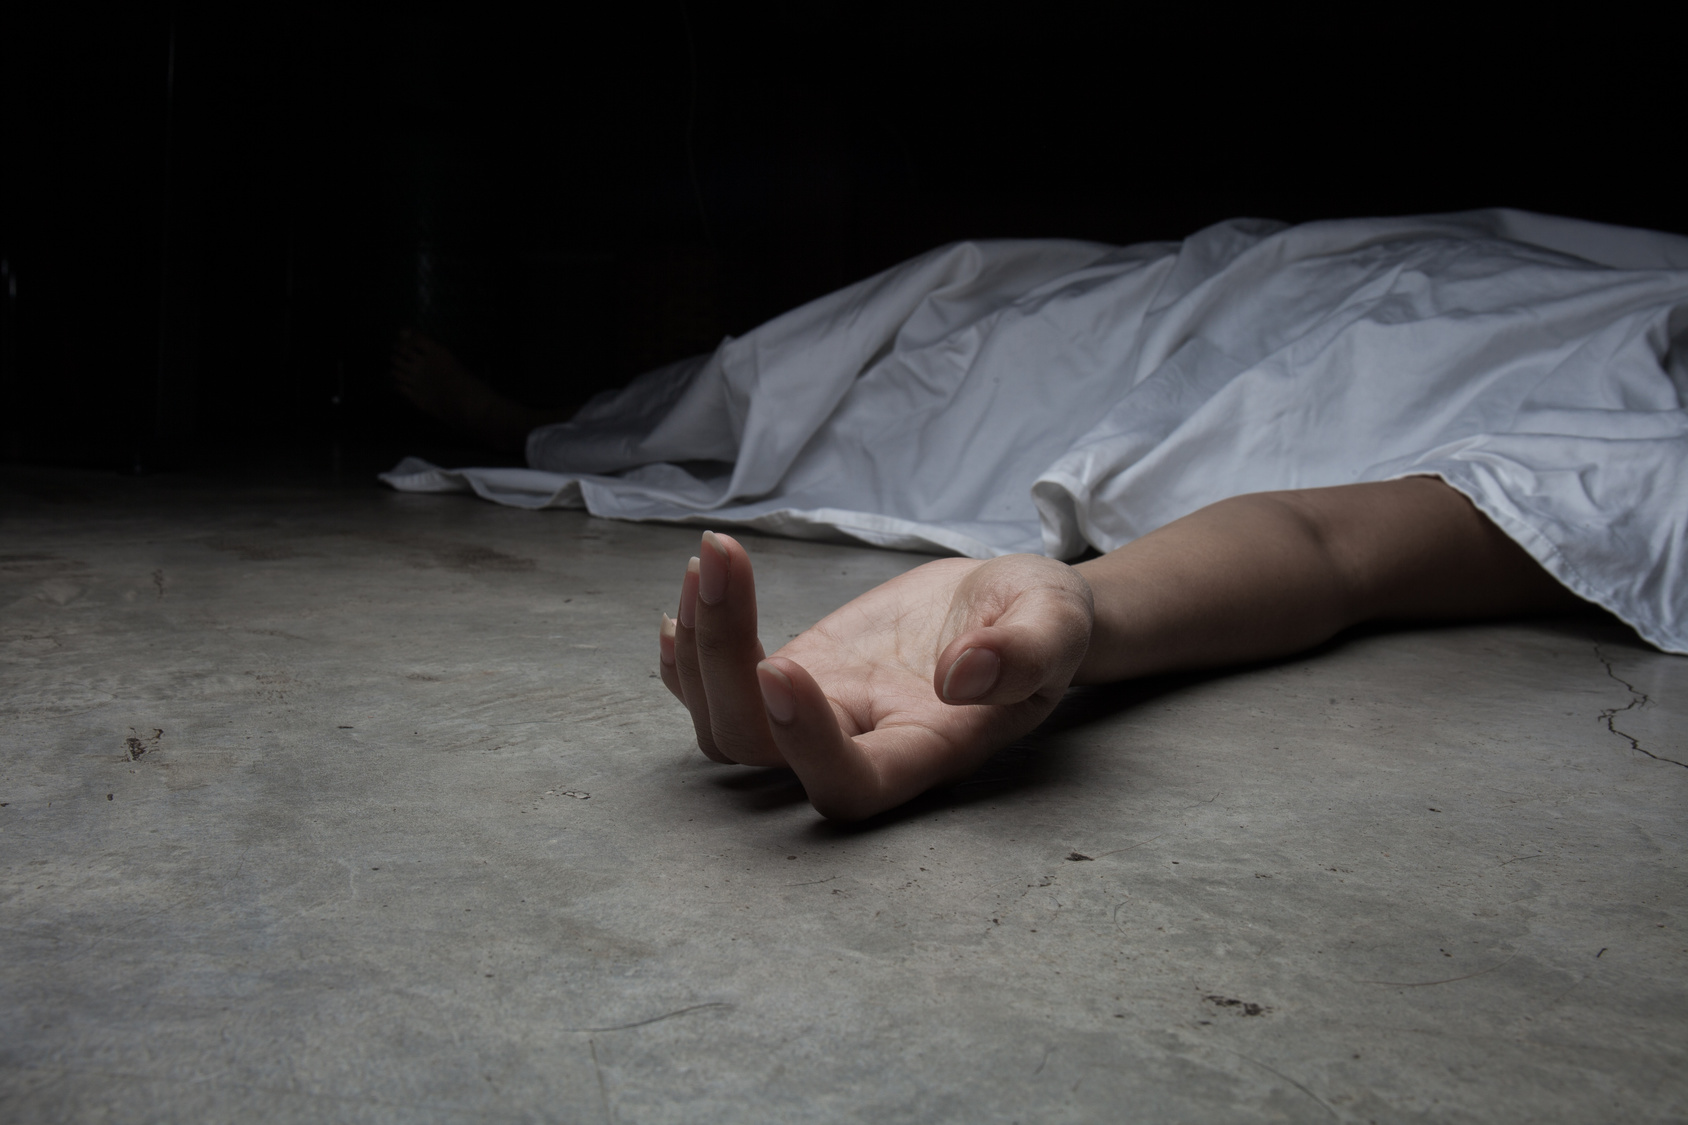 Familiendrama? Dreijährige hockt ganze Nacht neben toter Mutter